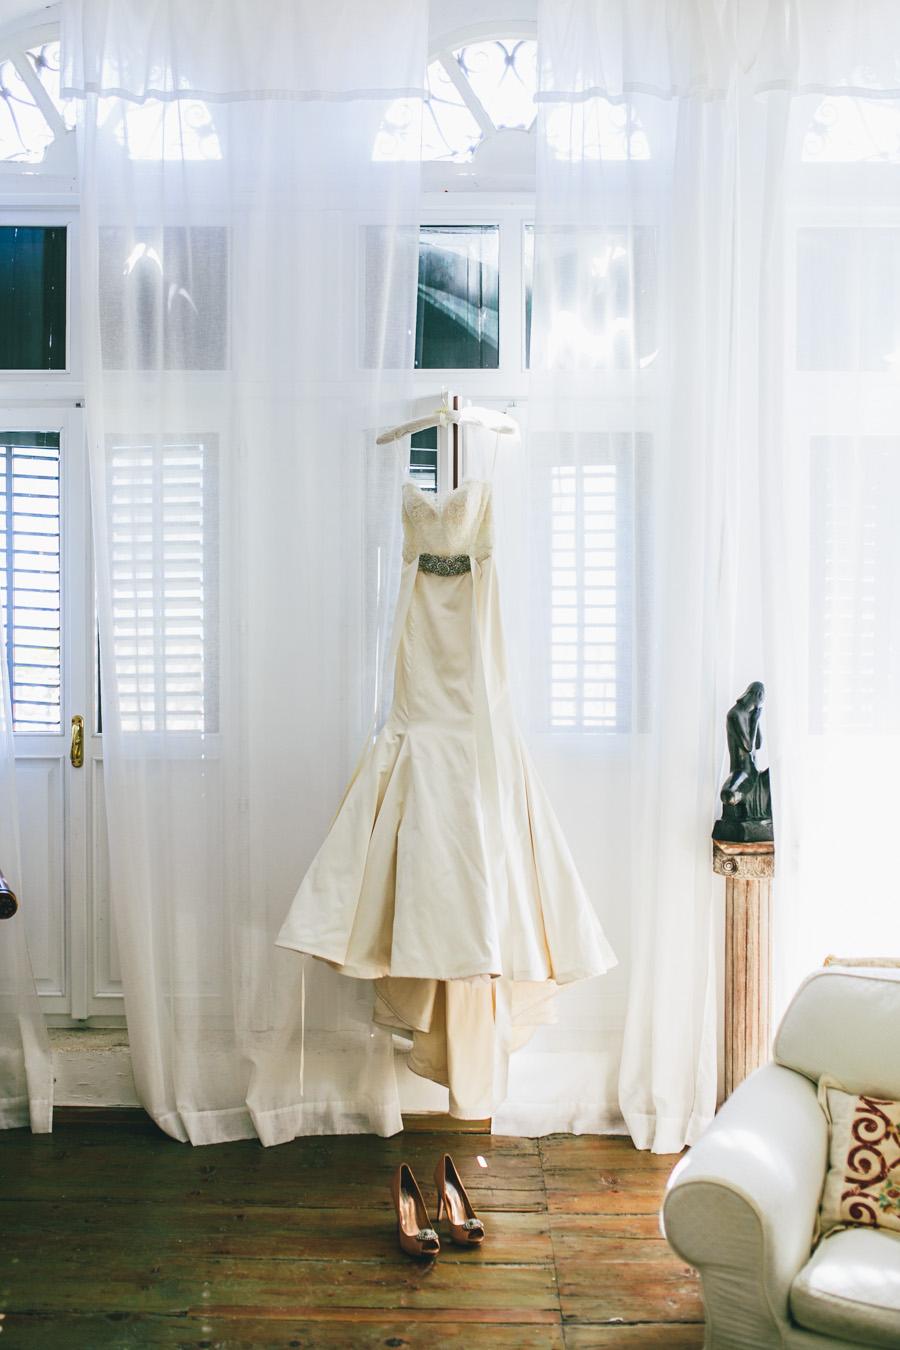 0453_lifestories__wedding_Paris_Photography_0453_0453_lifestories__wedding_Paris_Photography_0453_lifestories__wedding_Paris_Photography_MK3_7500